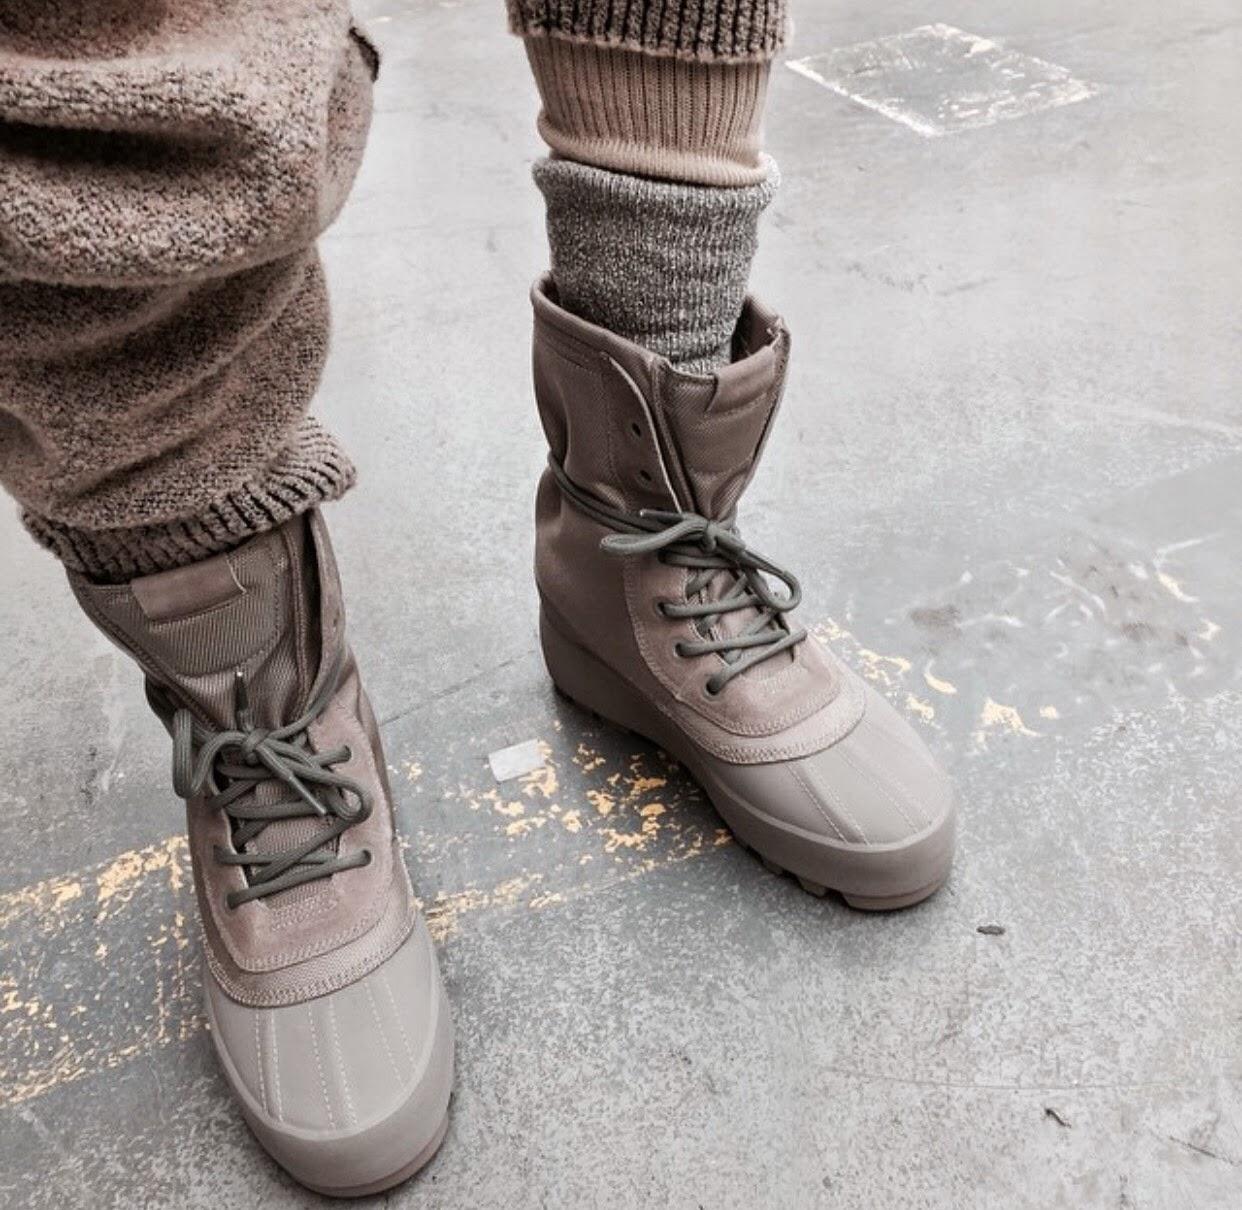 Kanye West SS15 via la modella mafia